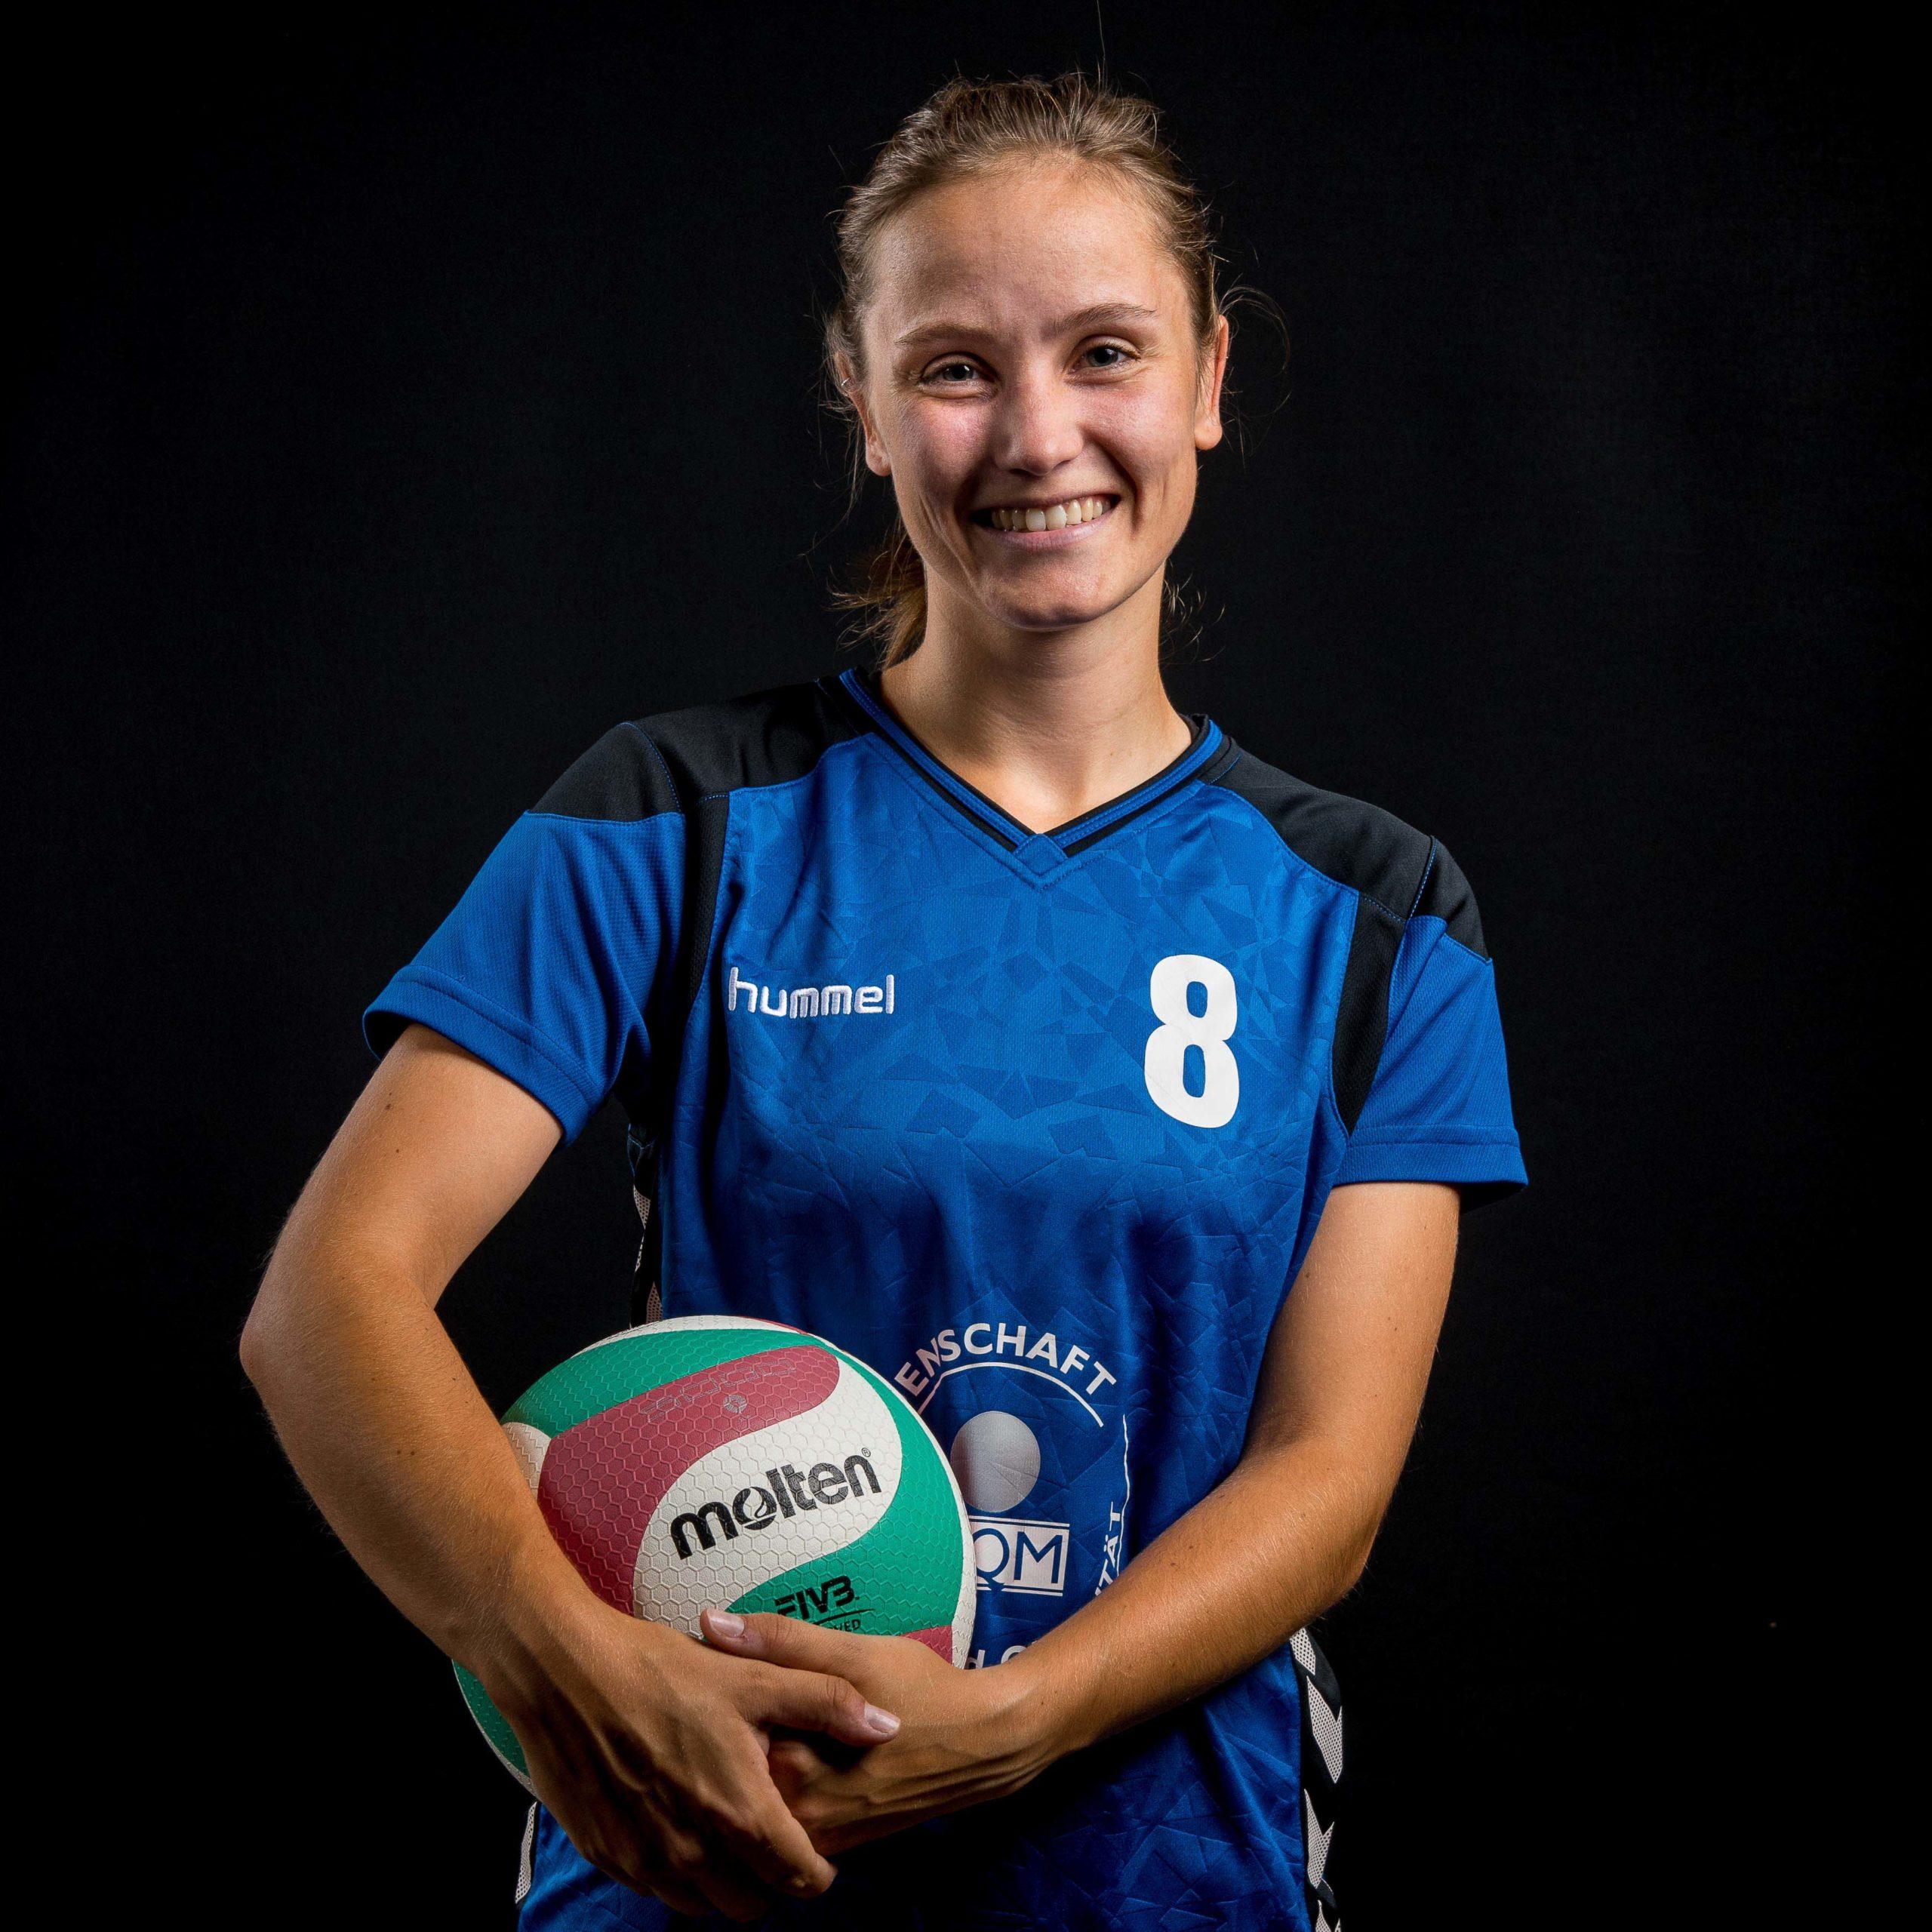 #8 Emily Zimmermann